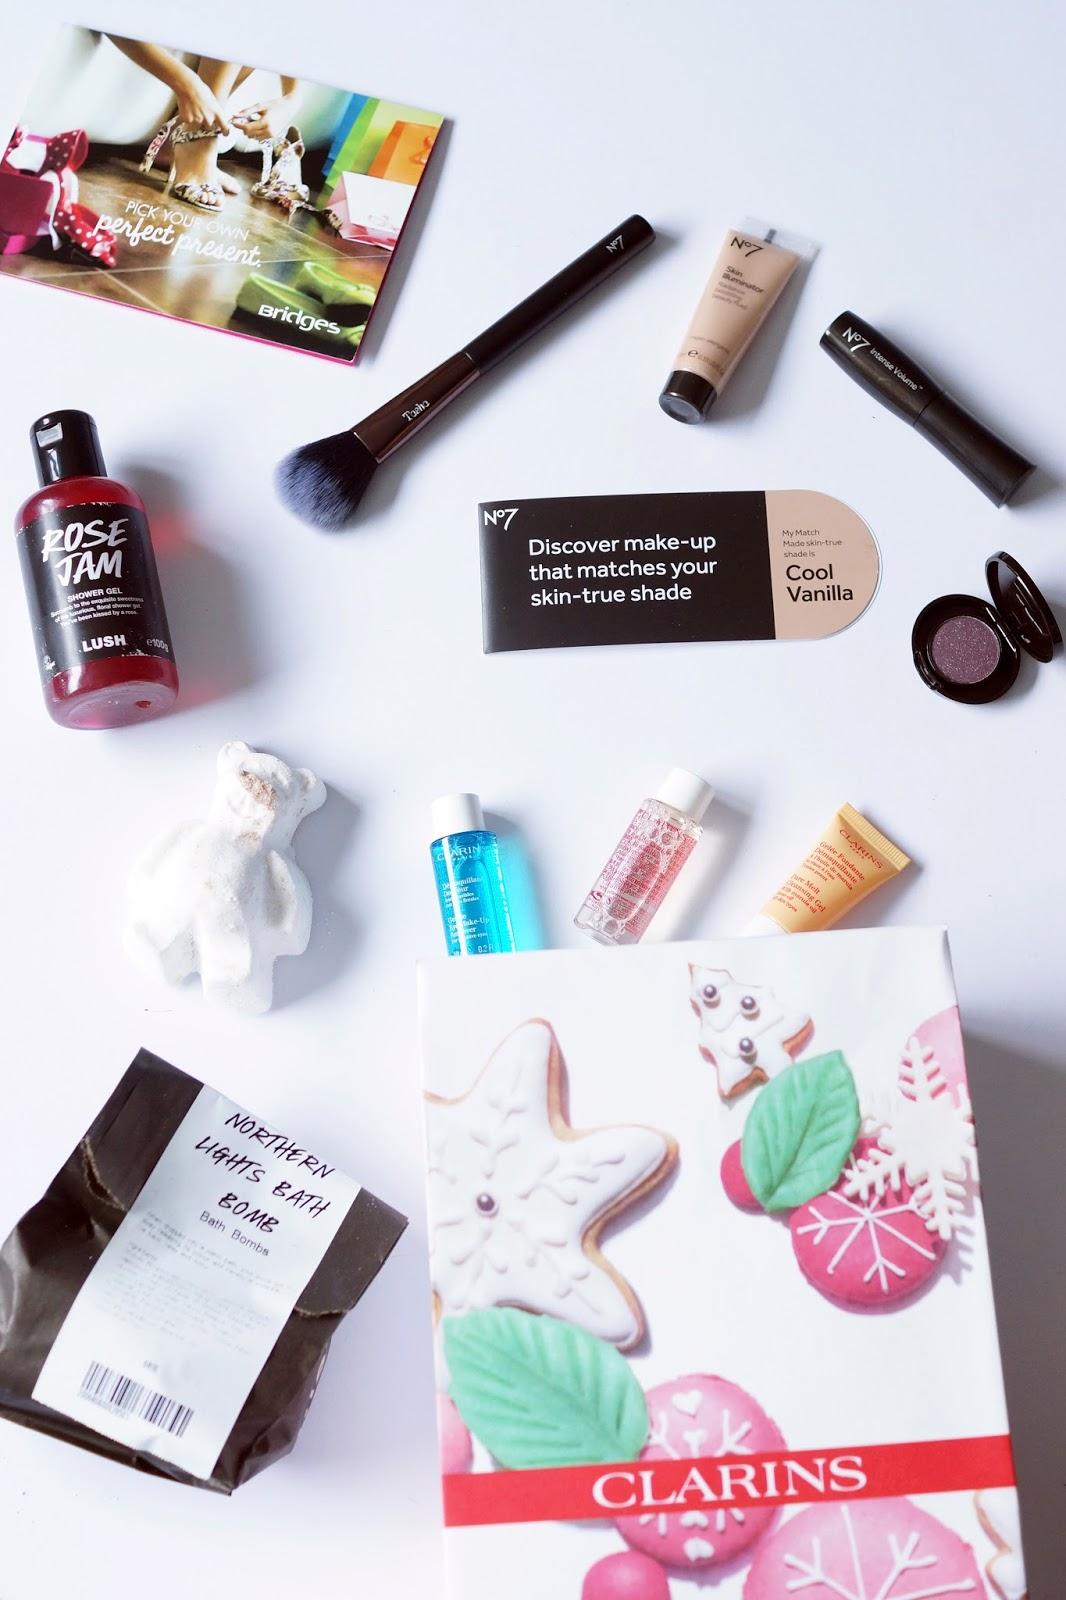 Hello Freckles Beauty The Bridges Sunderland NeBloggers Boots Debenhams Skincare Makeup Shopping